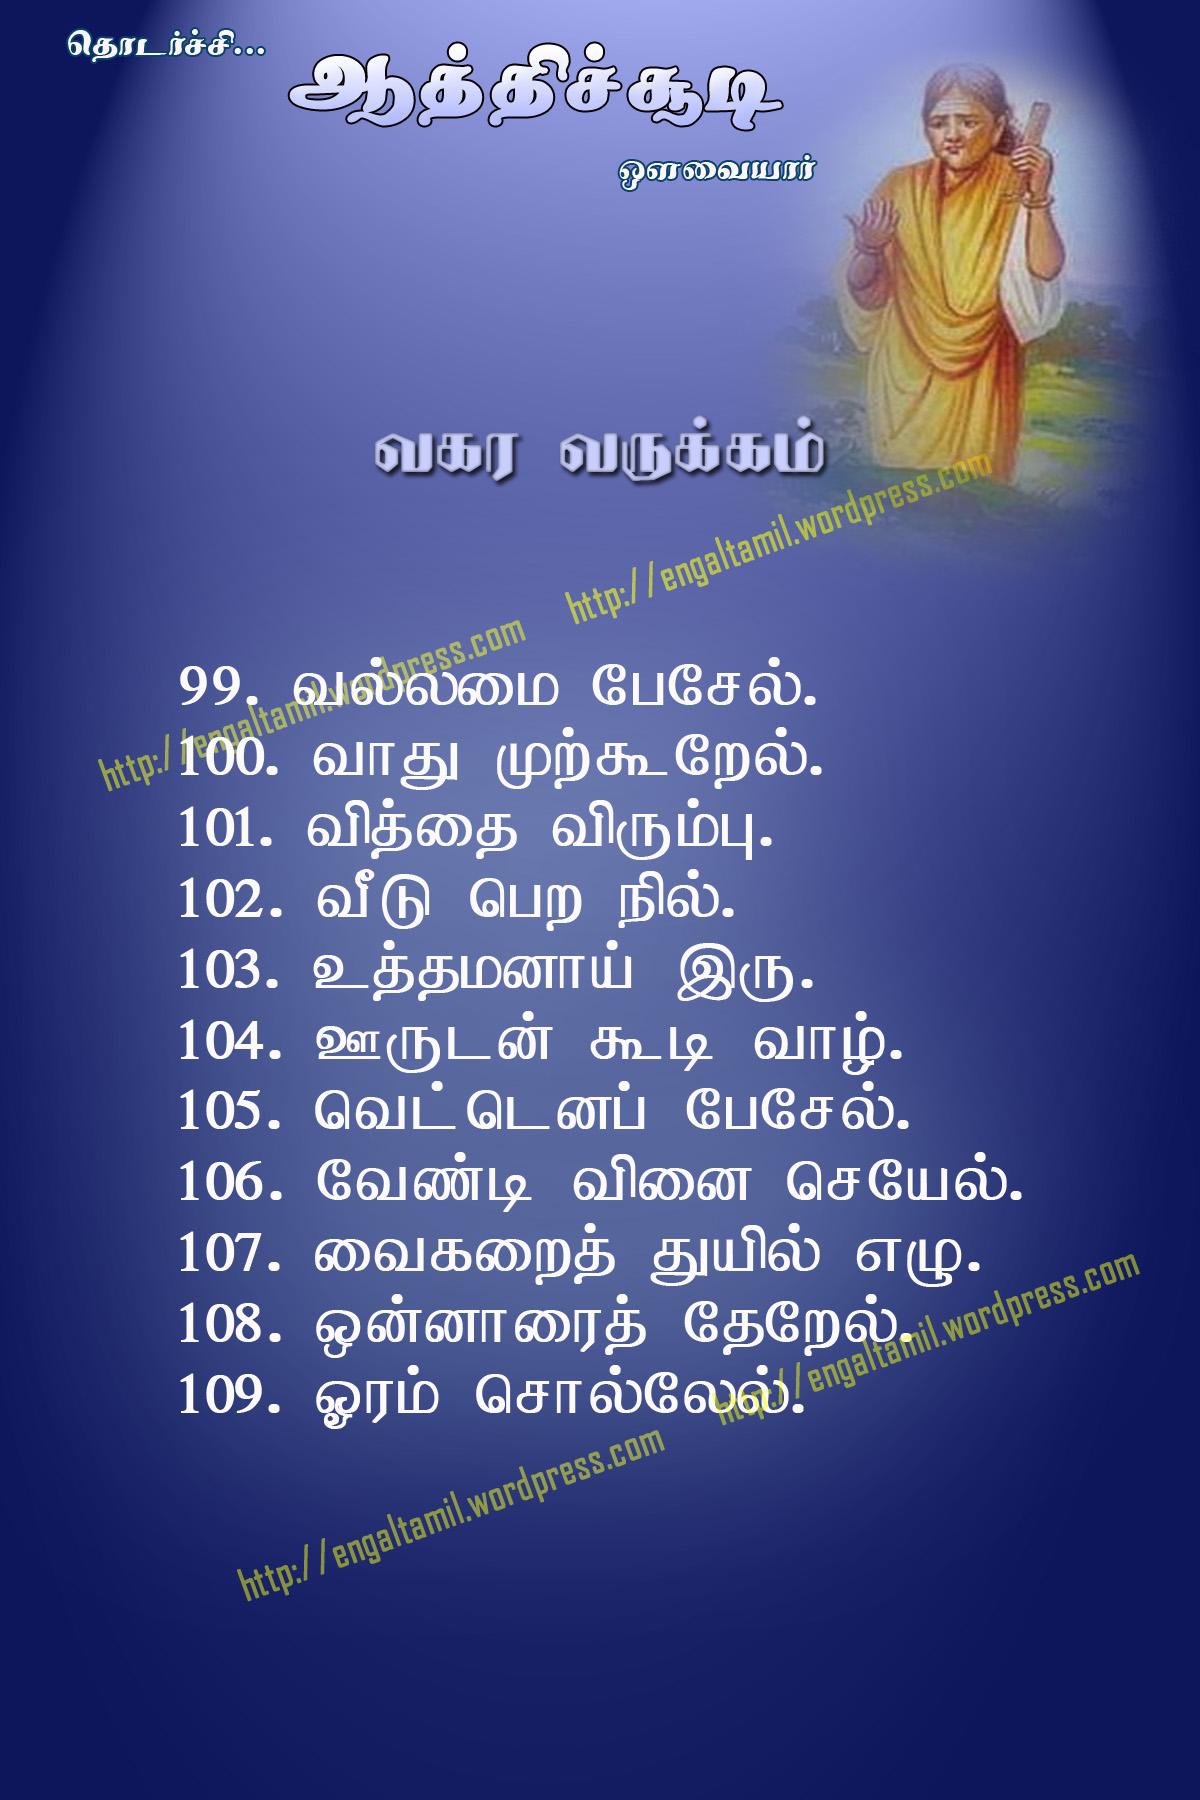 Avvaiyar aathichudi in tamil